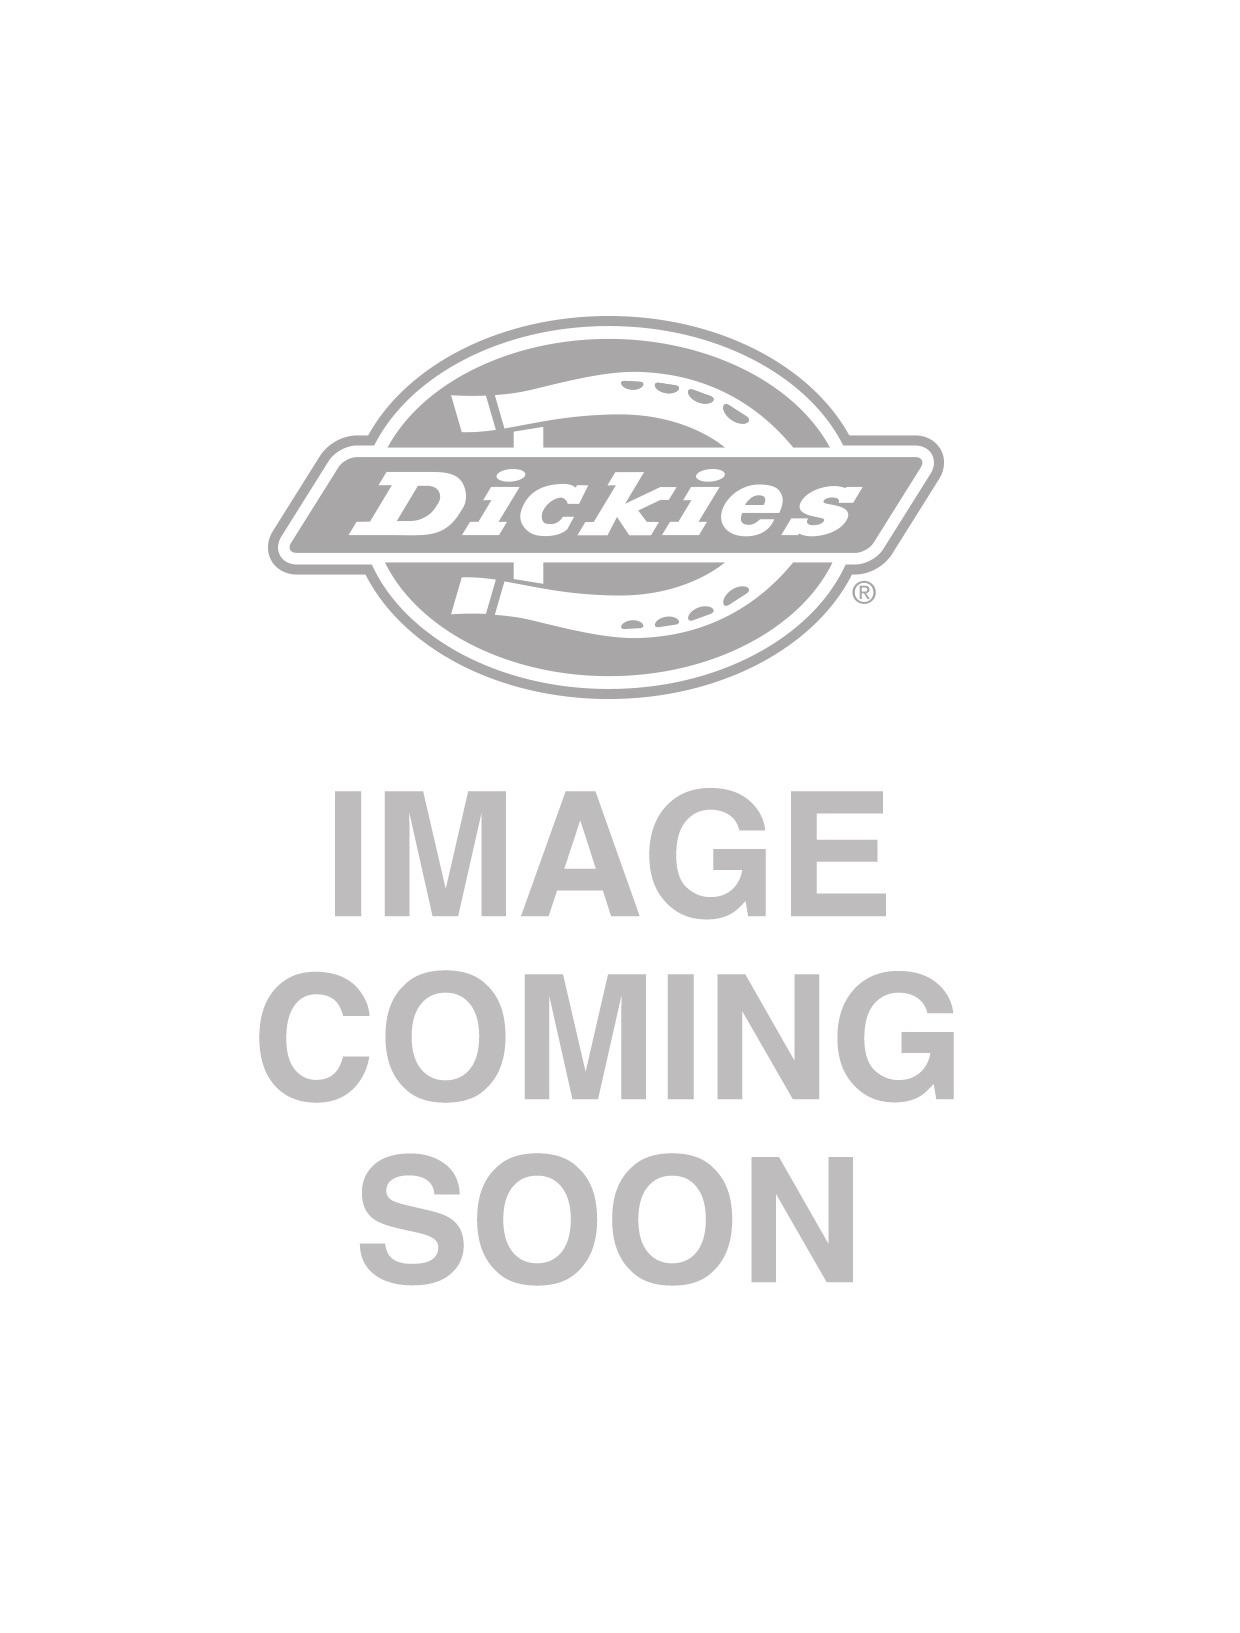 000230d1c1 DK200060BD01-1_1.jpg